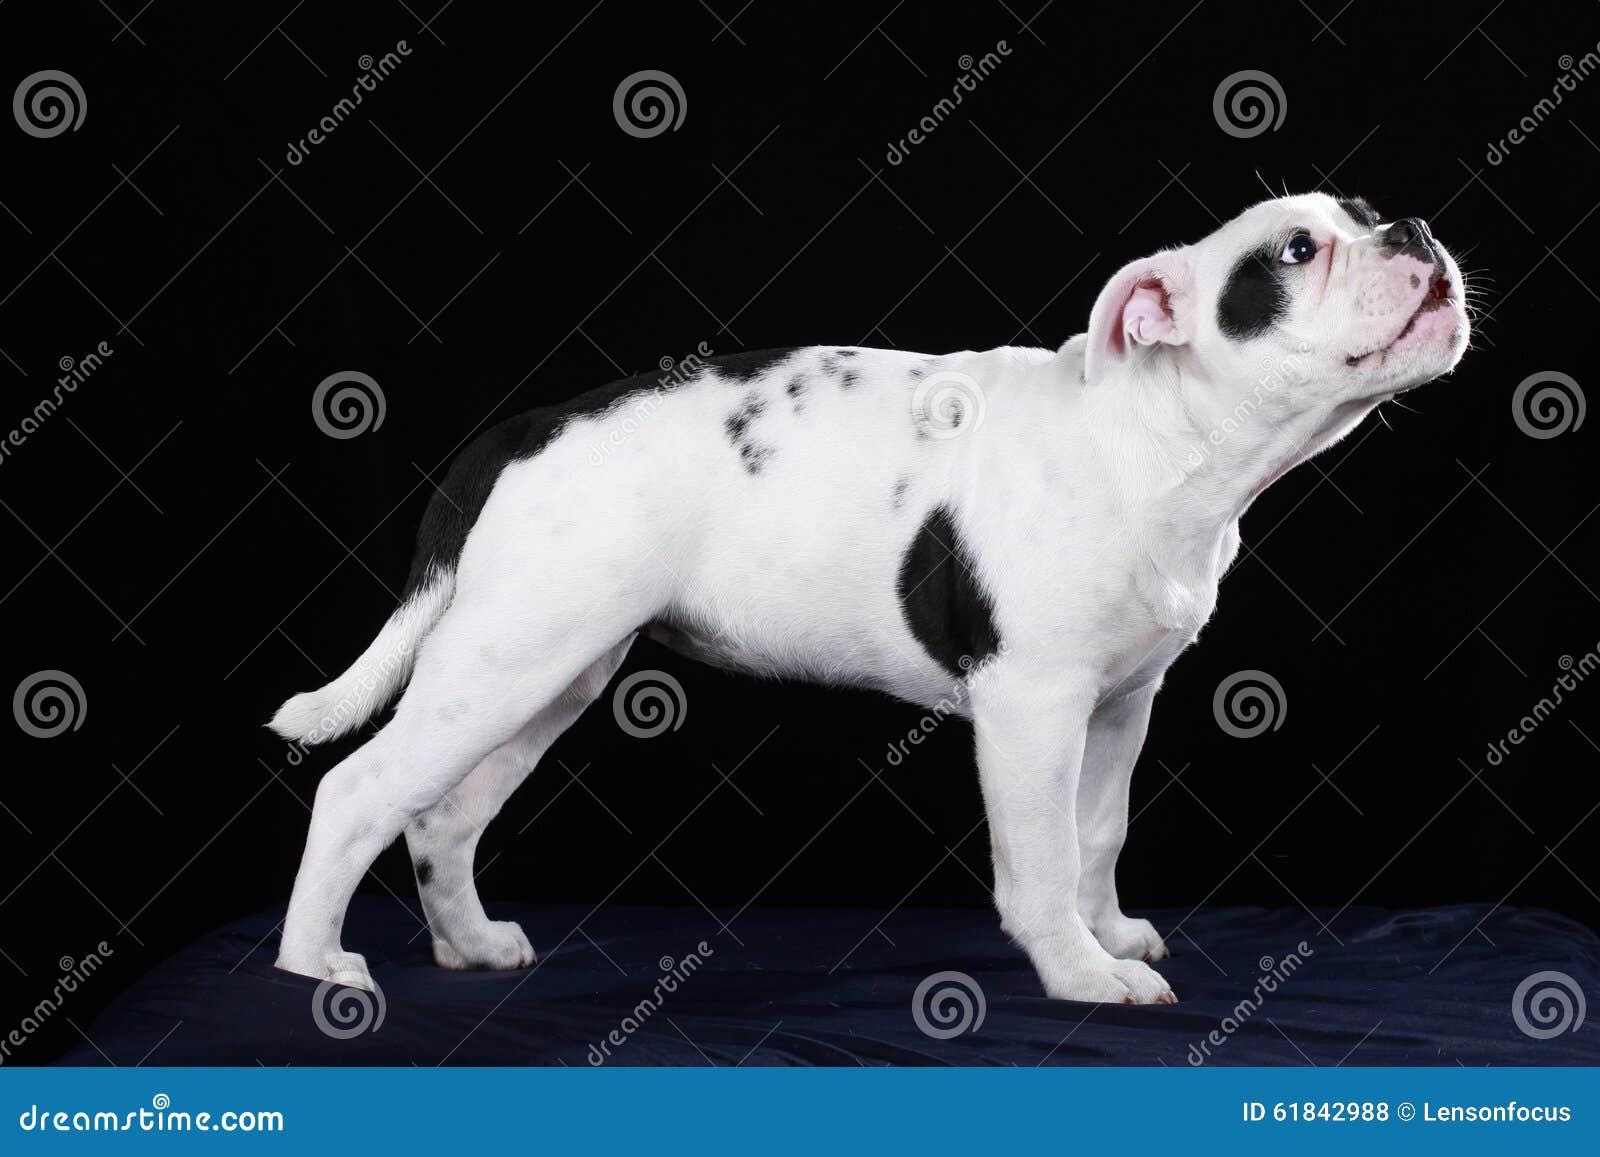 Cute Black And White Old English Bulldog Puppy Stock Photo Image